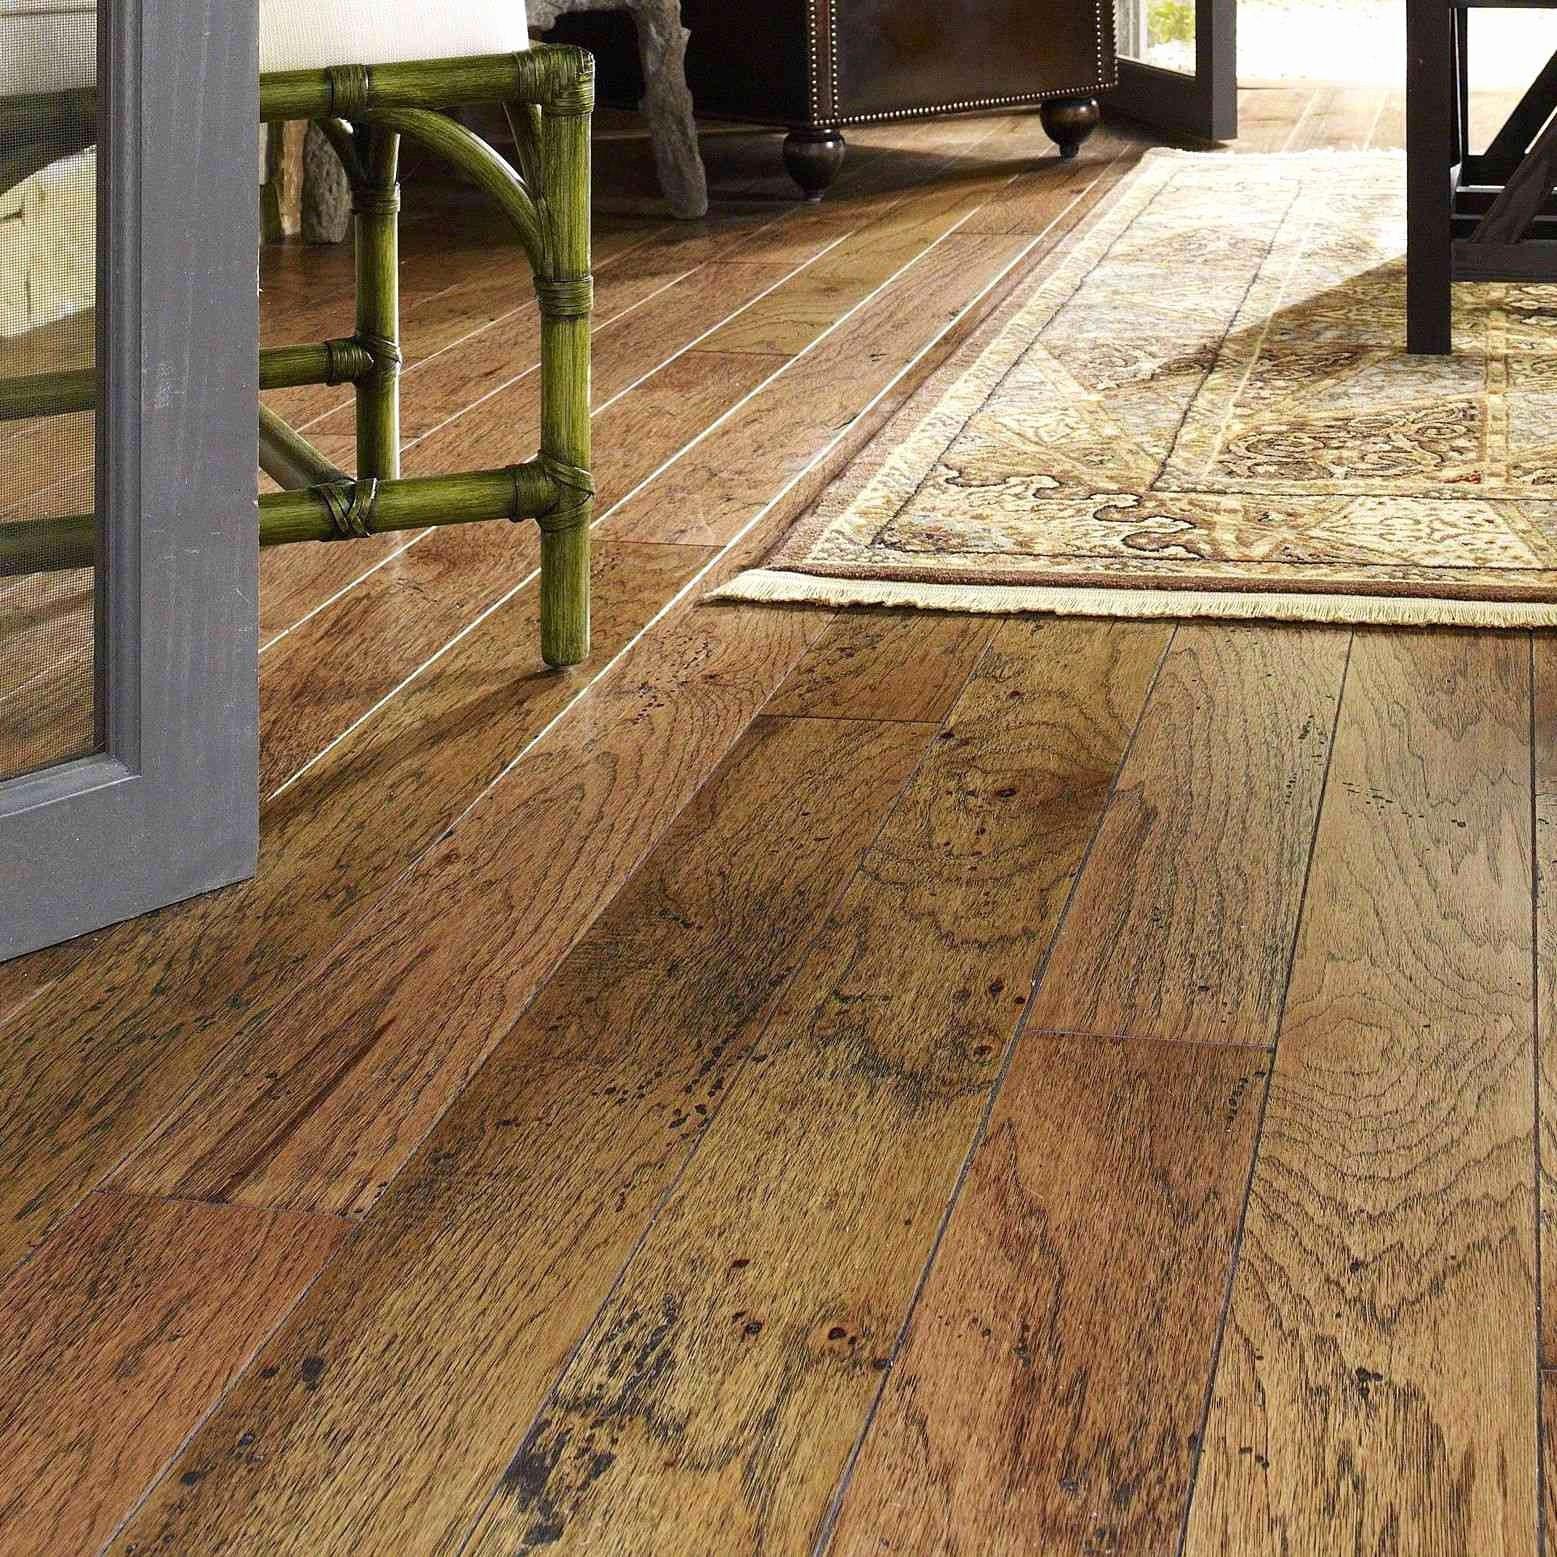 Old Hardwood Floors Of 17 Best Of Install Hardwood Floor Image Dizpos Com Regarding Install Hardwood Floor Fresh 50 Elegant Hardwood Floor Living Room Graphics 50 S Photograph Of 17